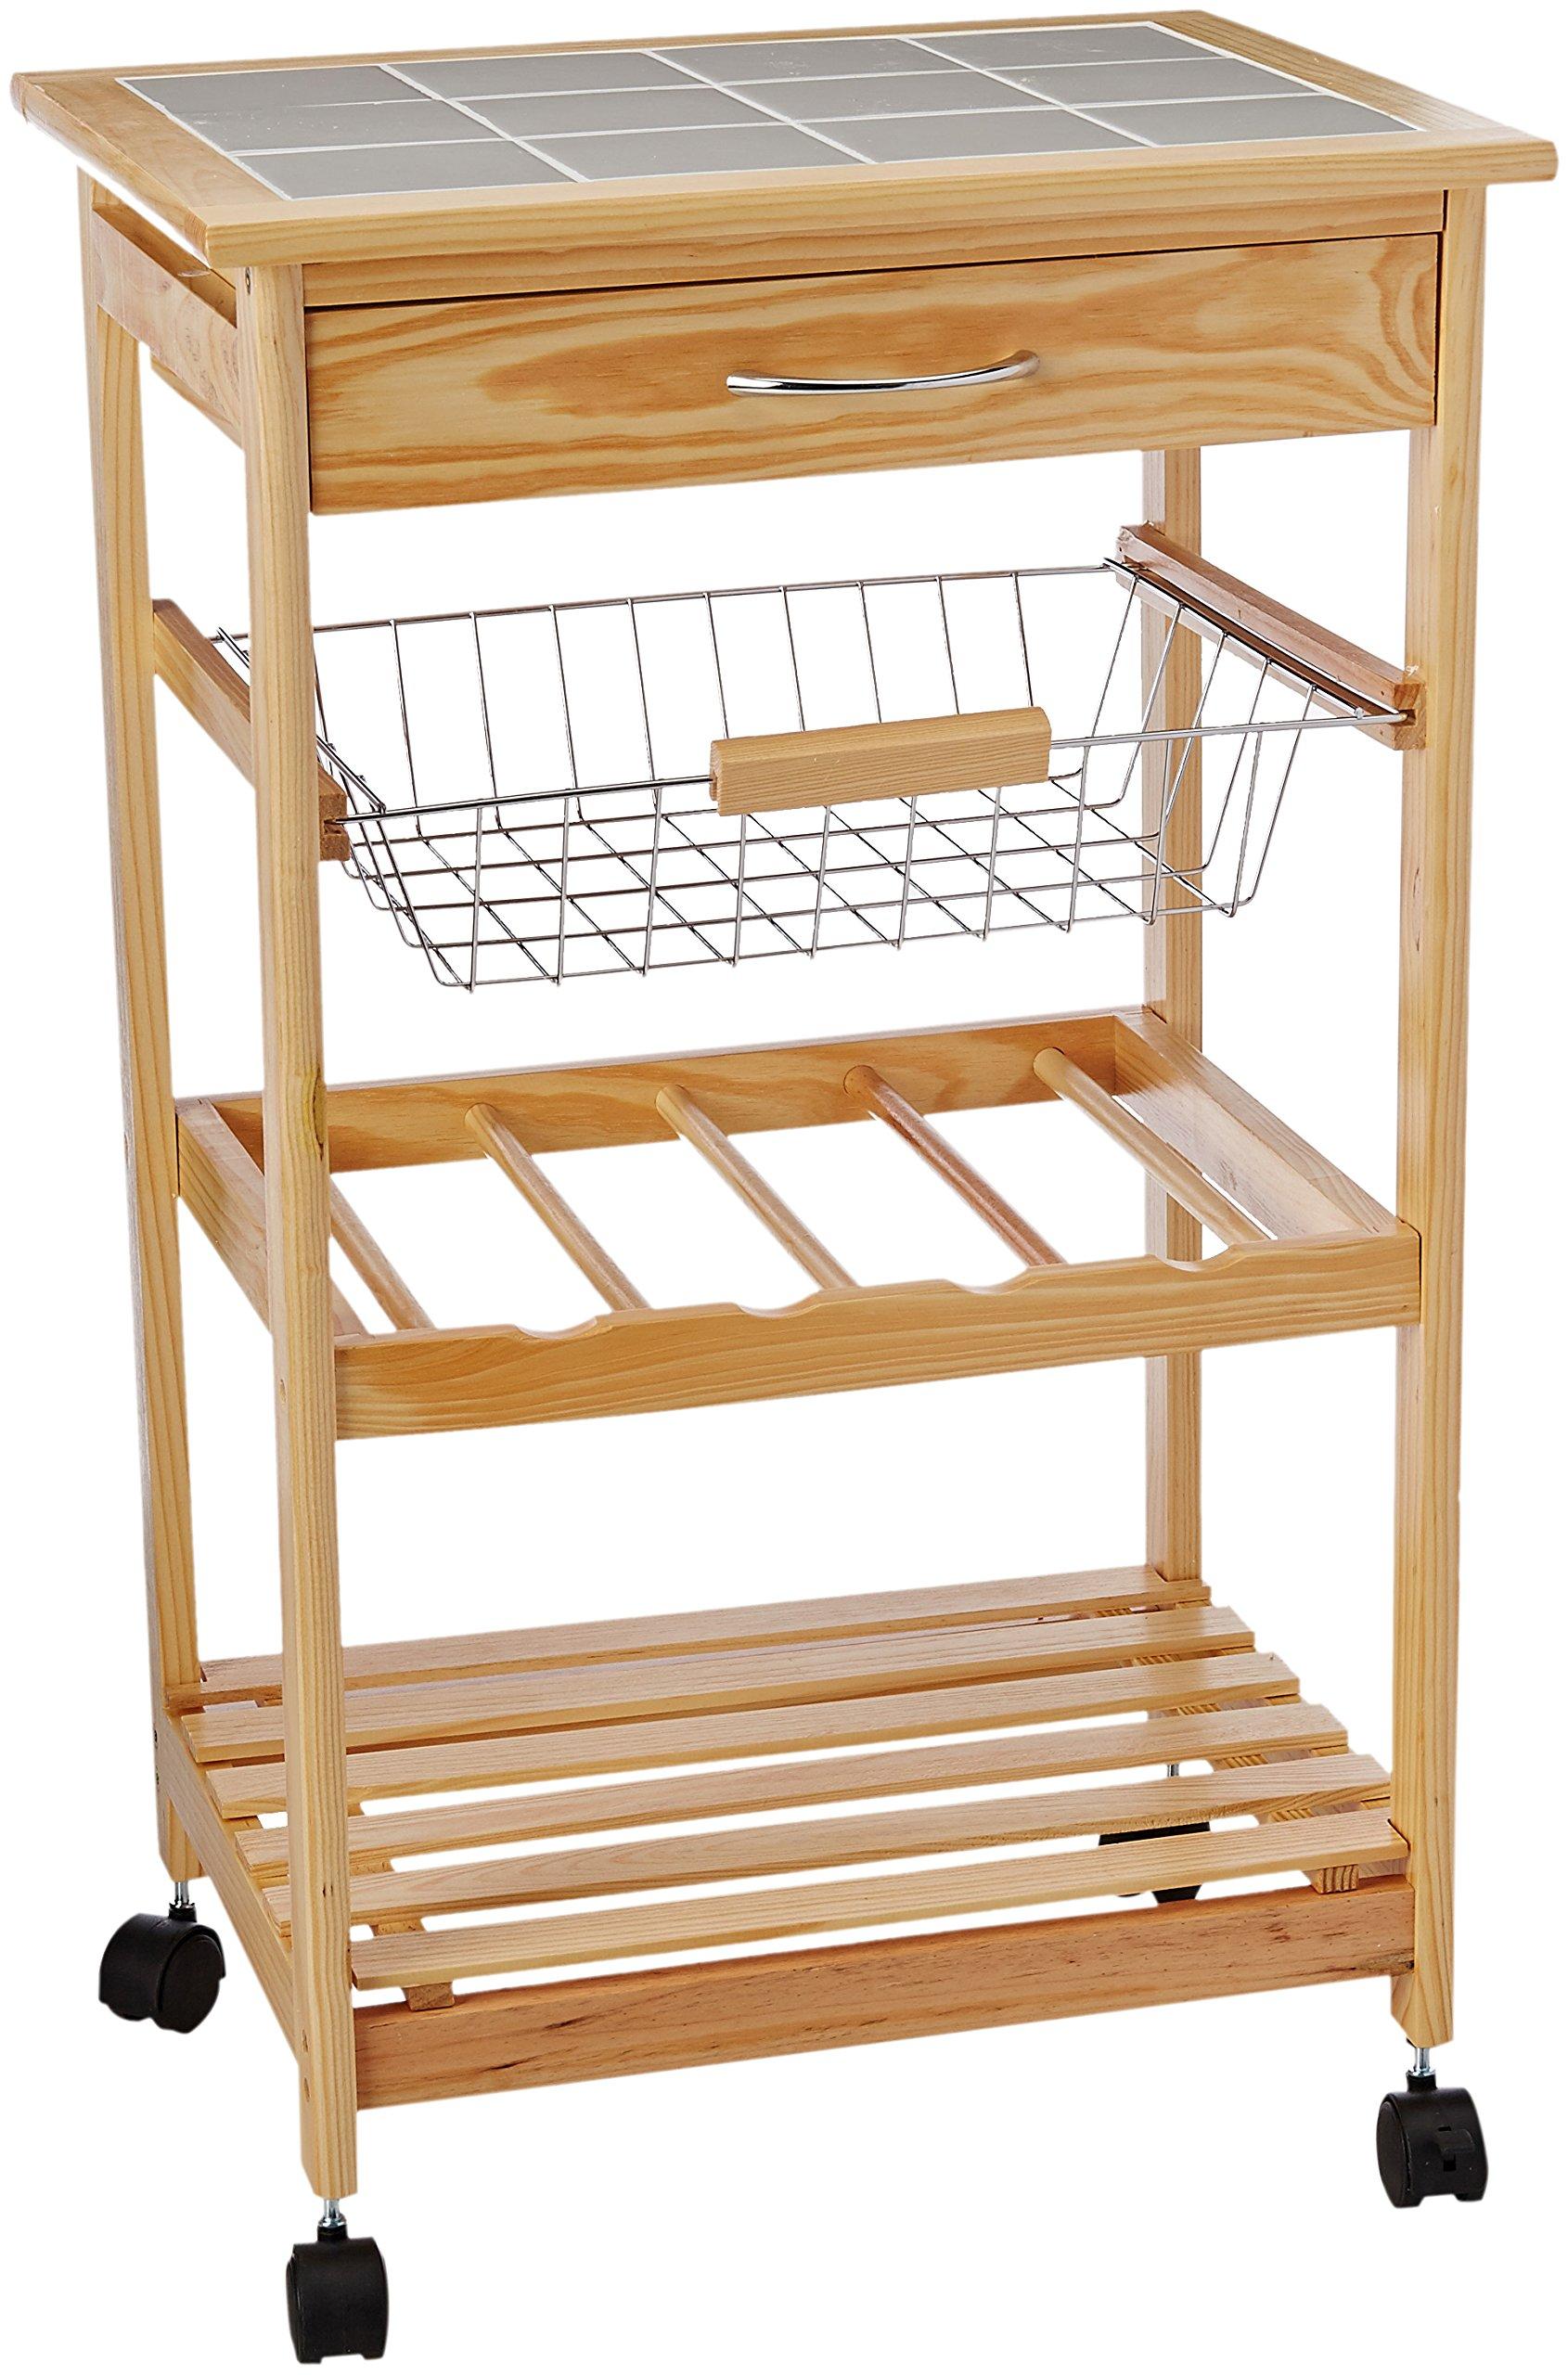 Organize It All Natural Pinewood Multi-Purpose Mobile Kitchen Cart